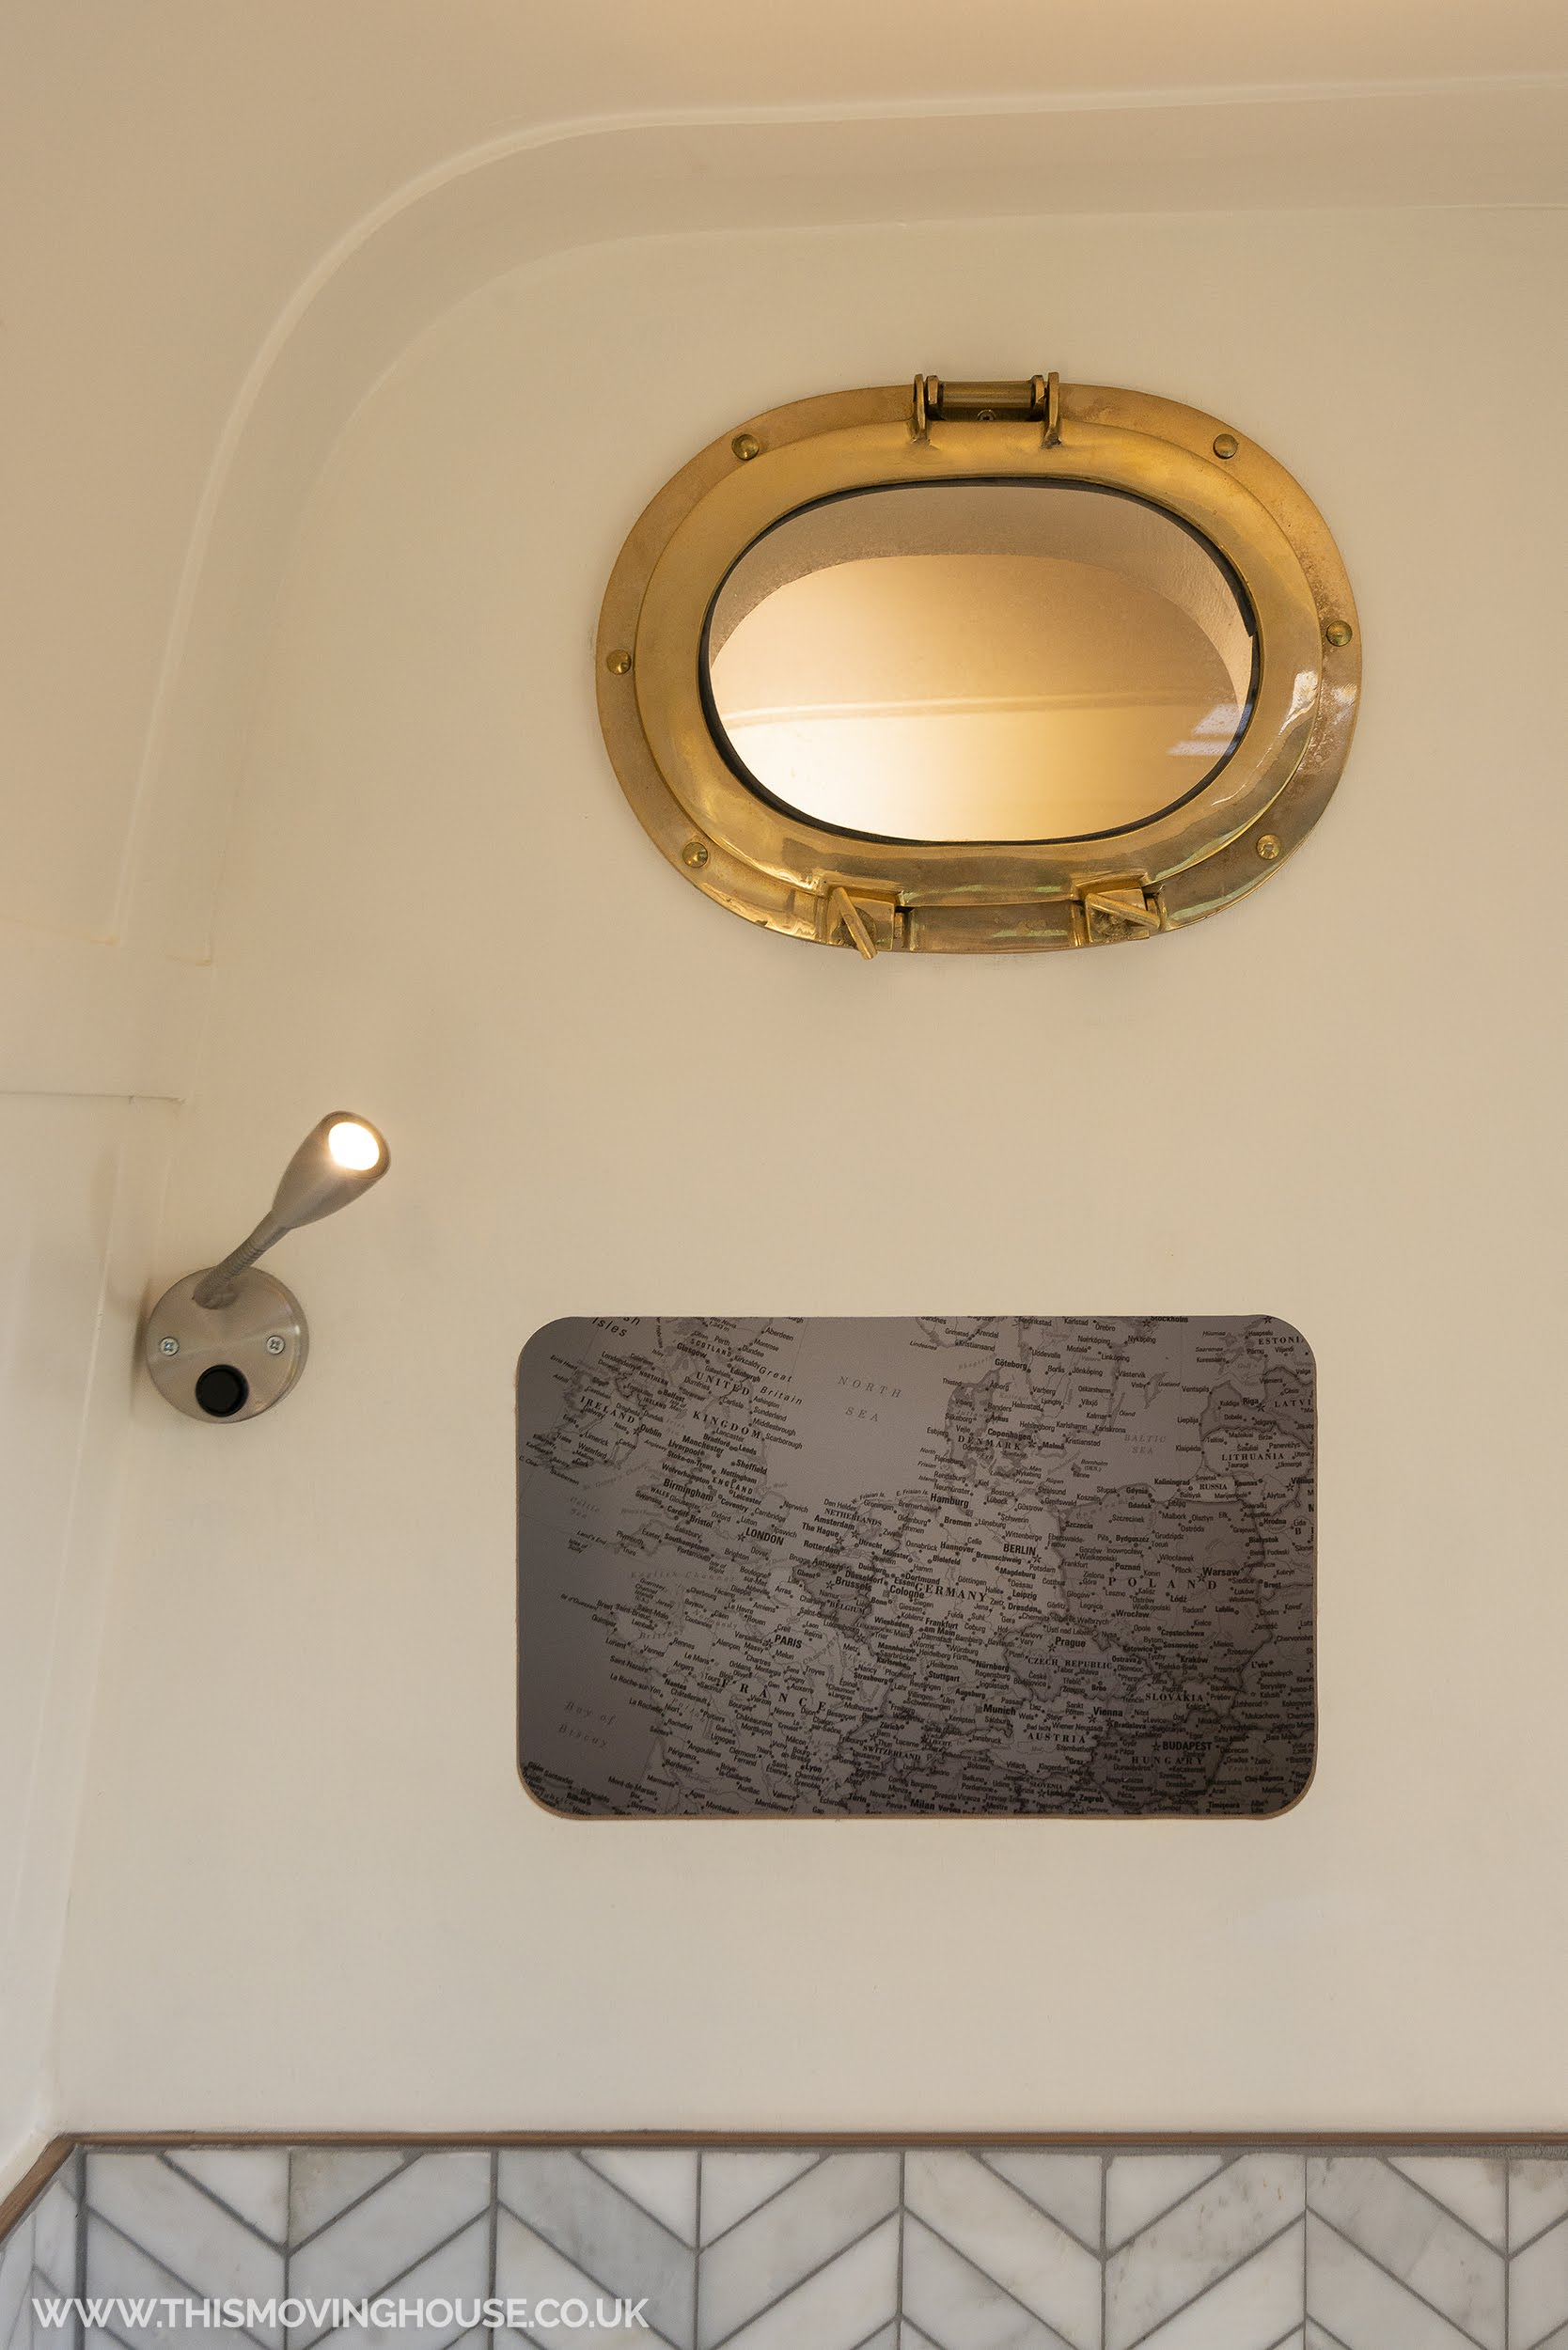 brass porthole lighting in camper van conversion